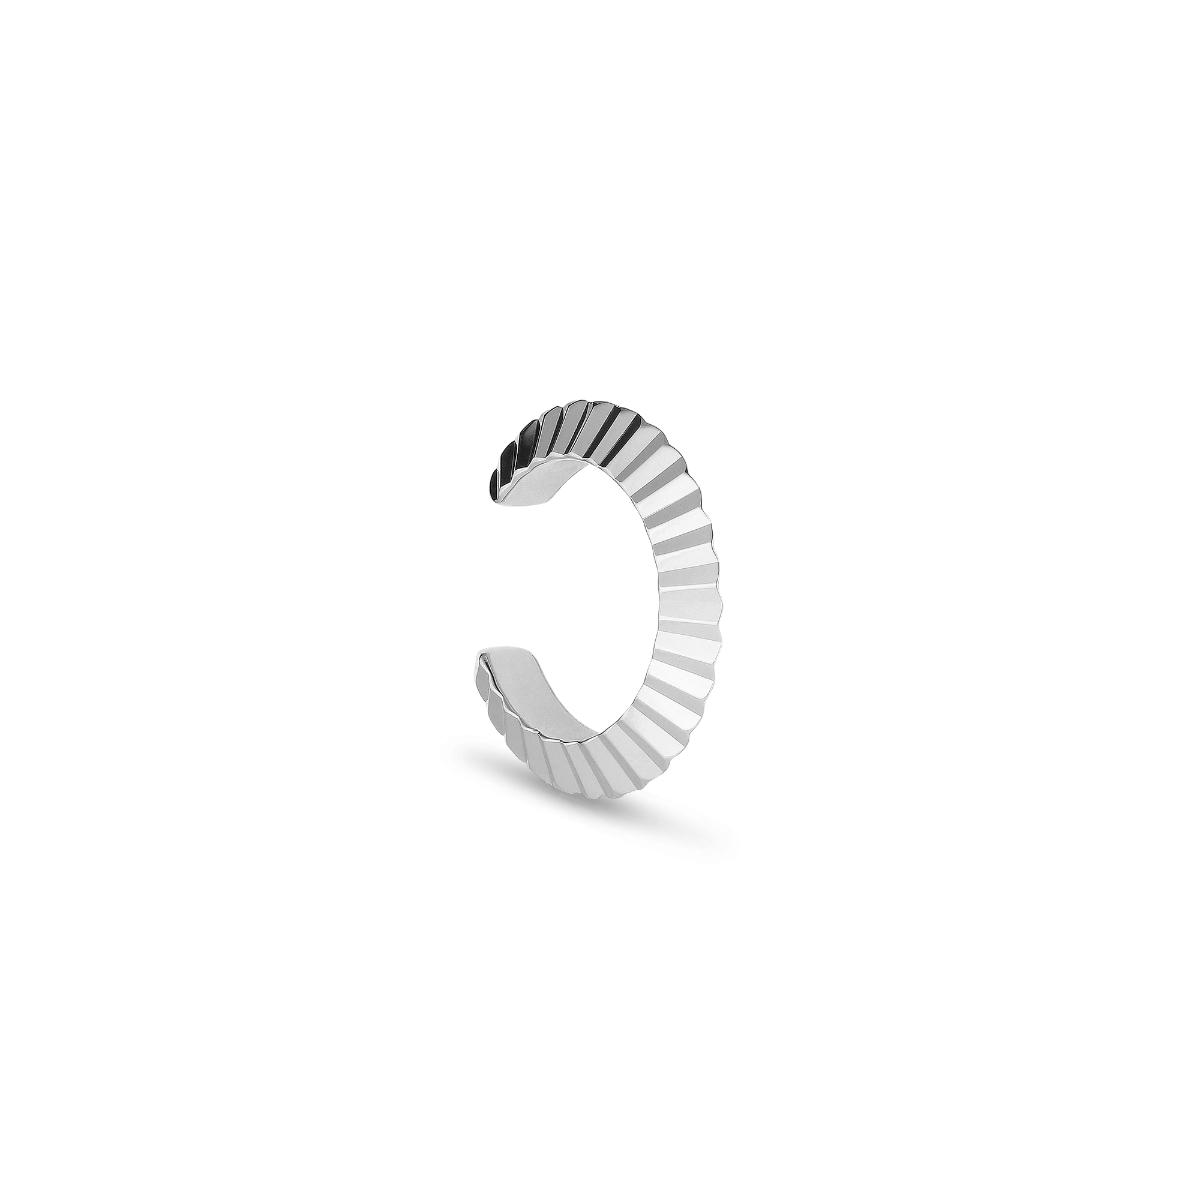 Jane Kønig small Reflection Cuff ørering, sølv